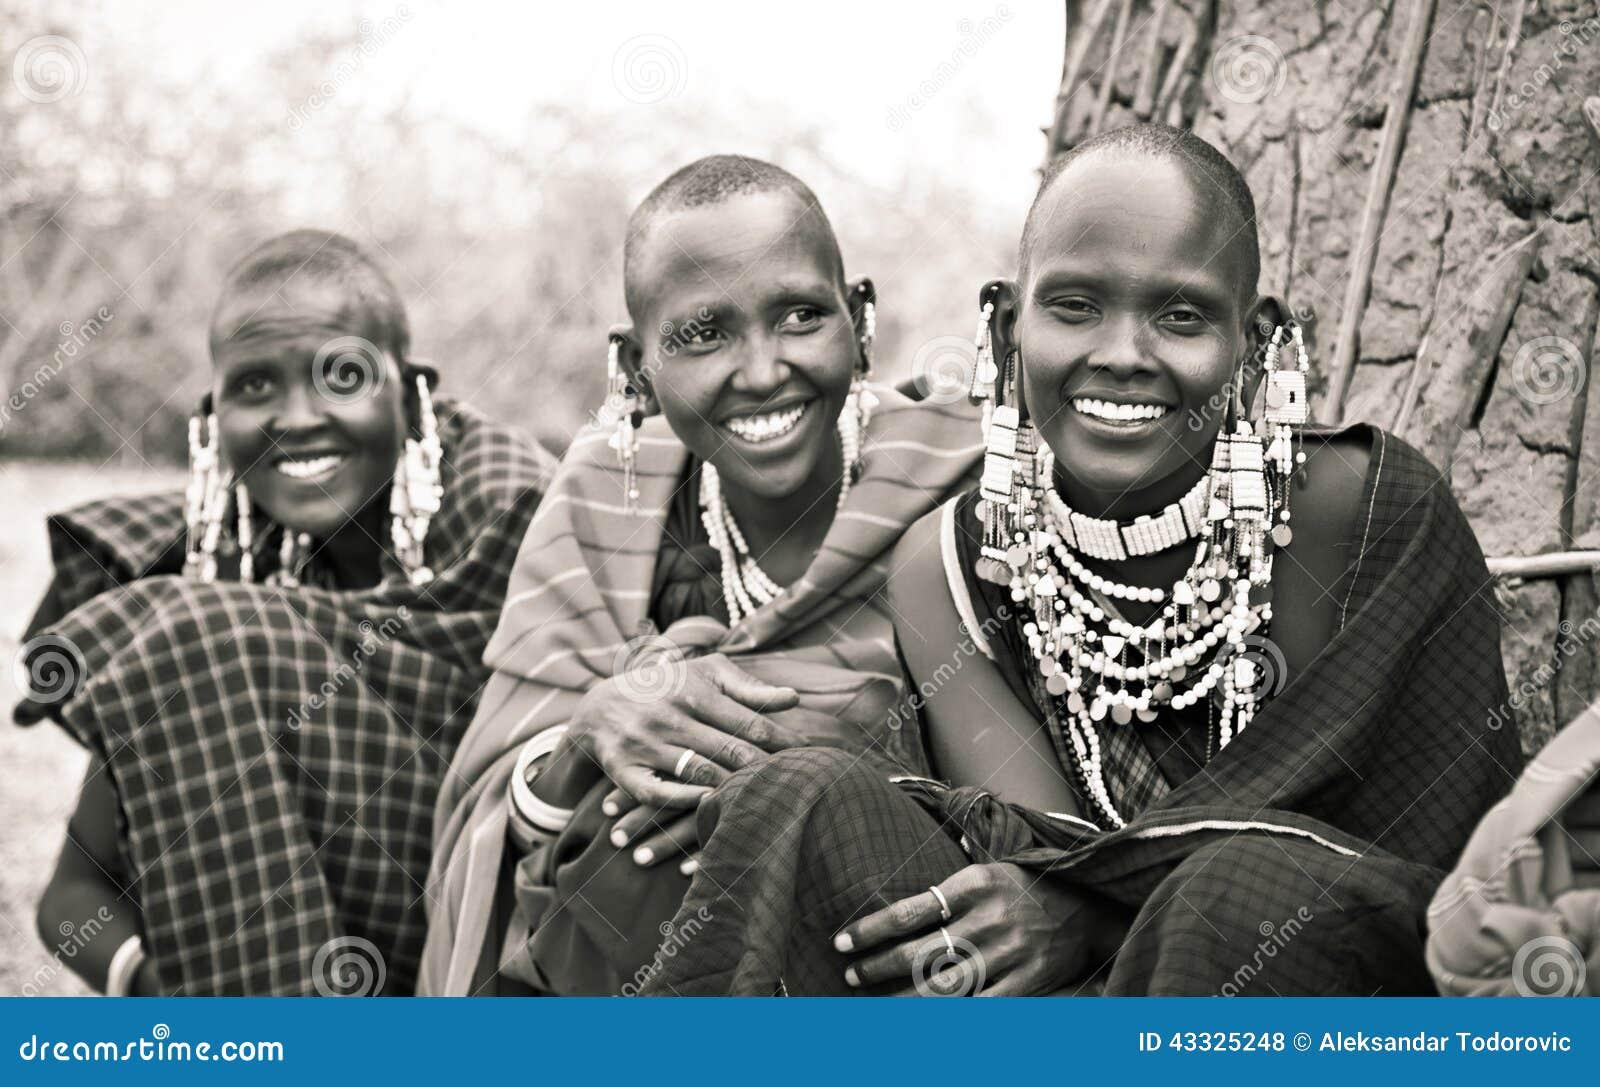 Masai with traditional ornaments, Tanzania.